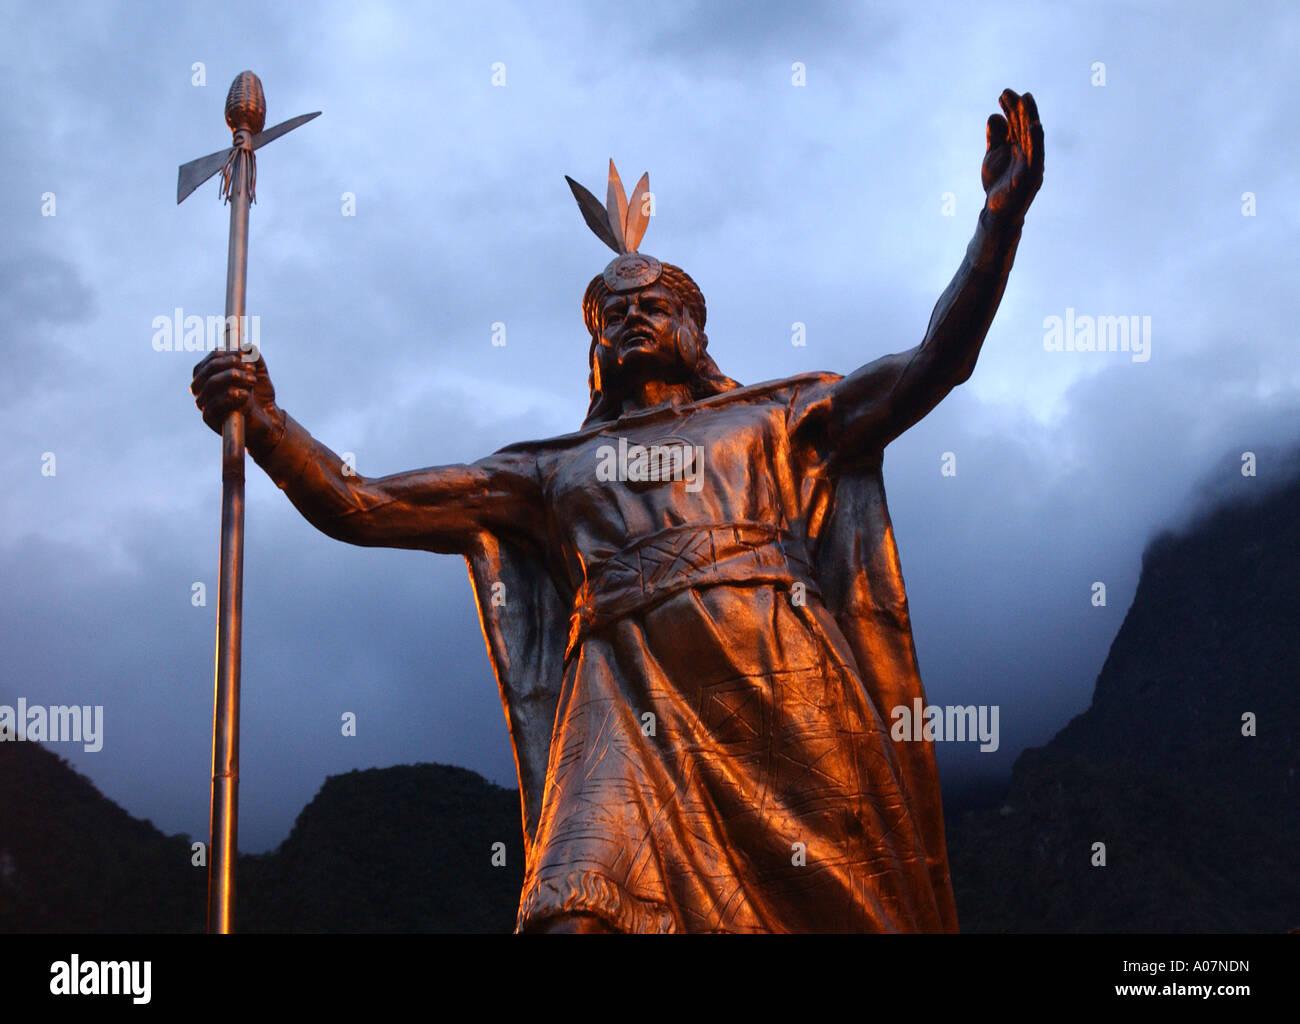 Statue of Emperor Pachacuti in Machu Picchu Pueblo Aguas Calentes - Stock Image